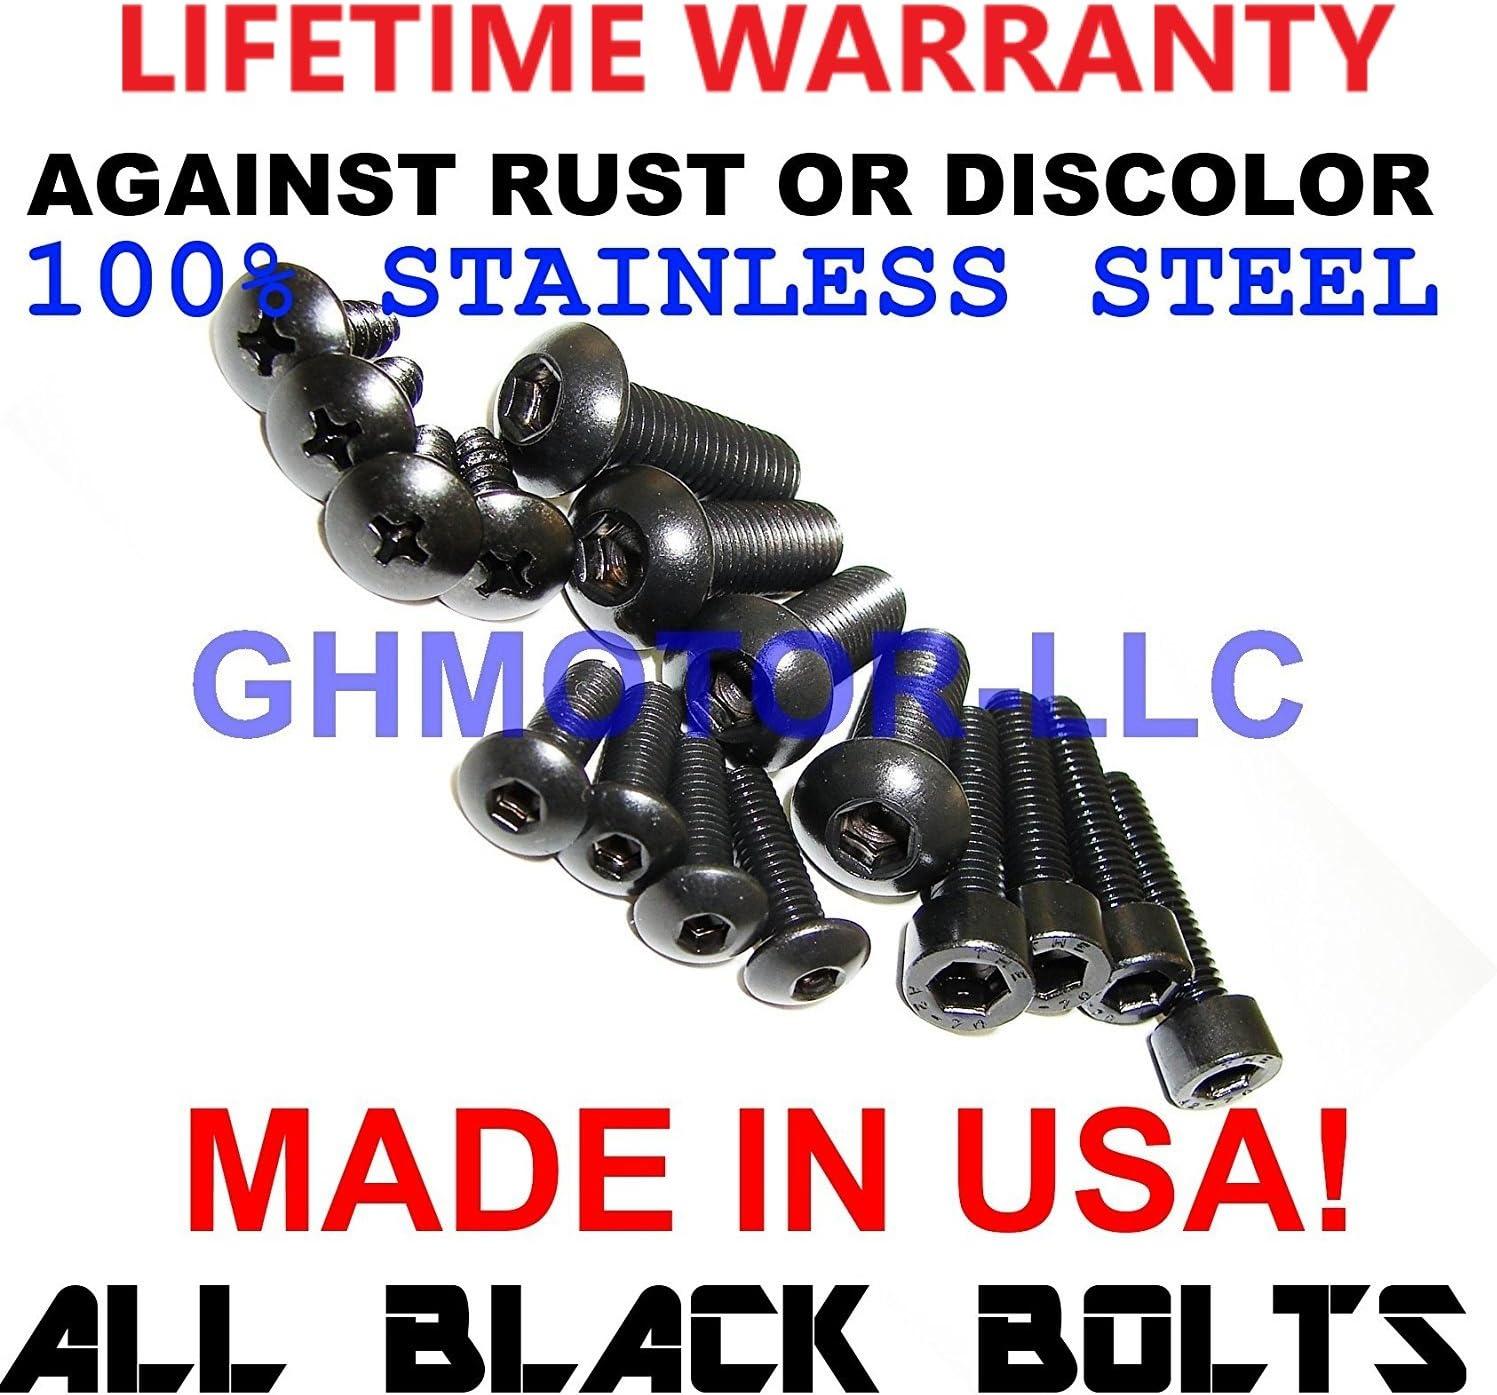 2004 2005 GSX-R GSXR 600 750 Fairings Bolts Screws Fasteners Kit Set Made in USA Silver